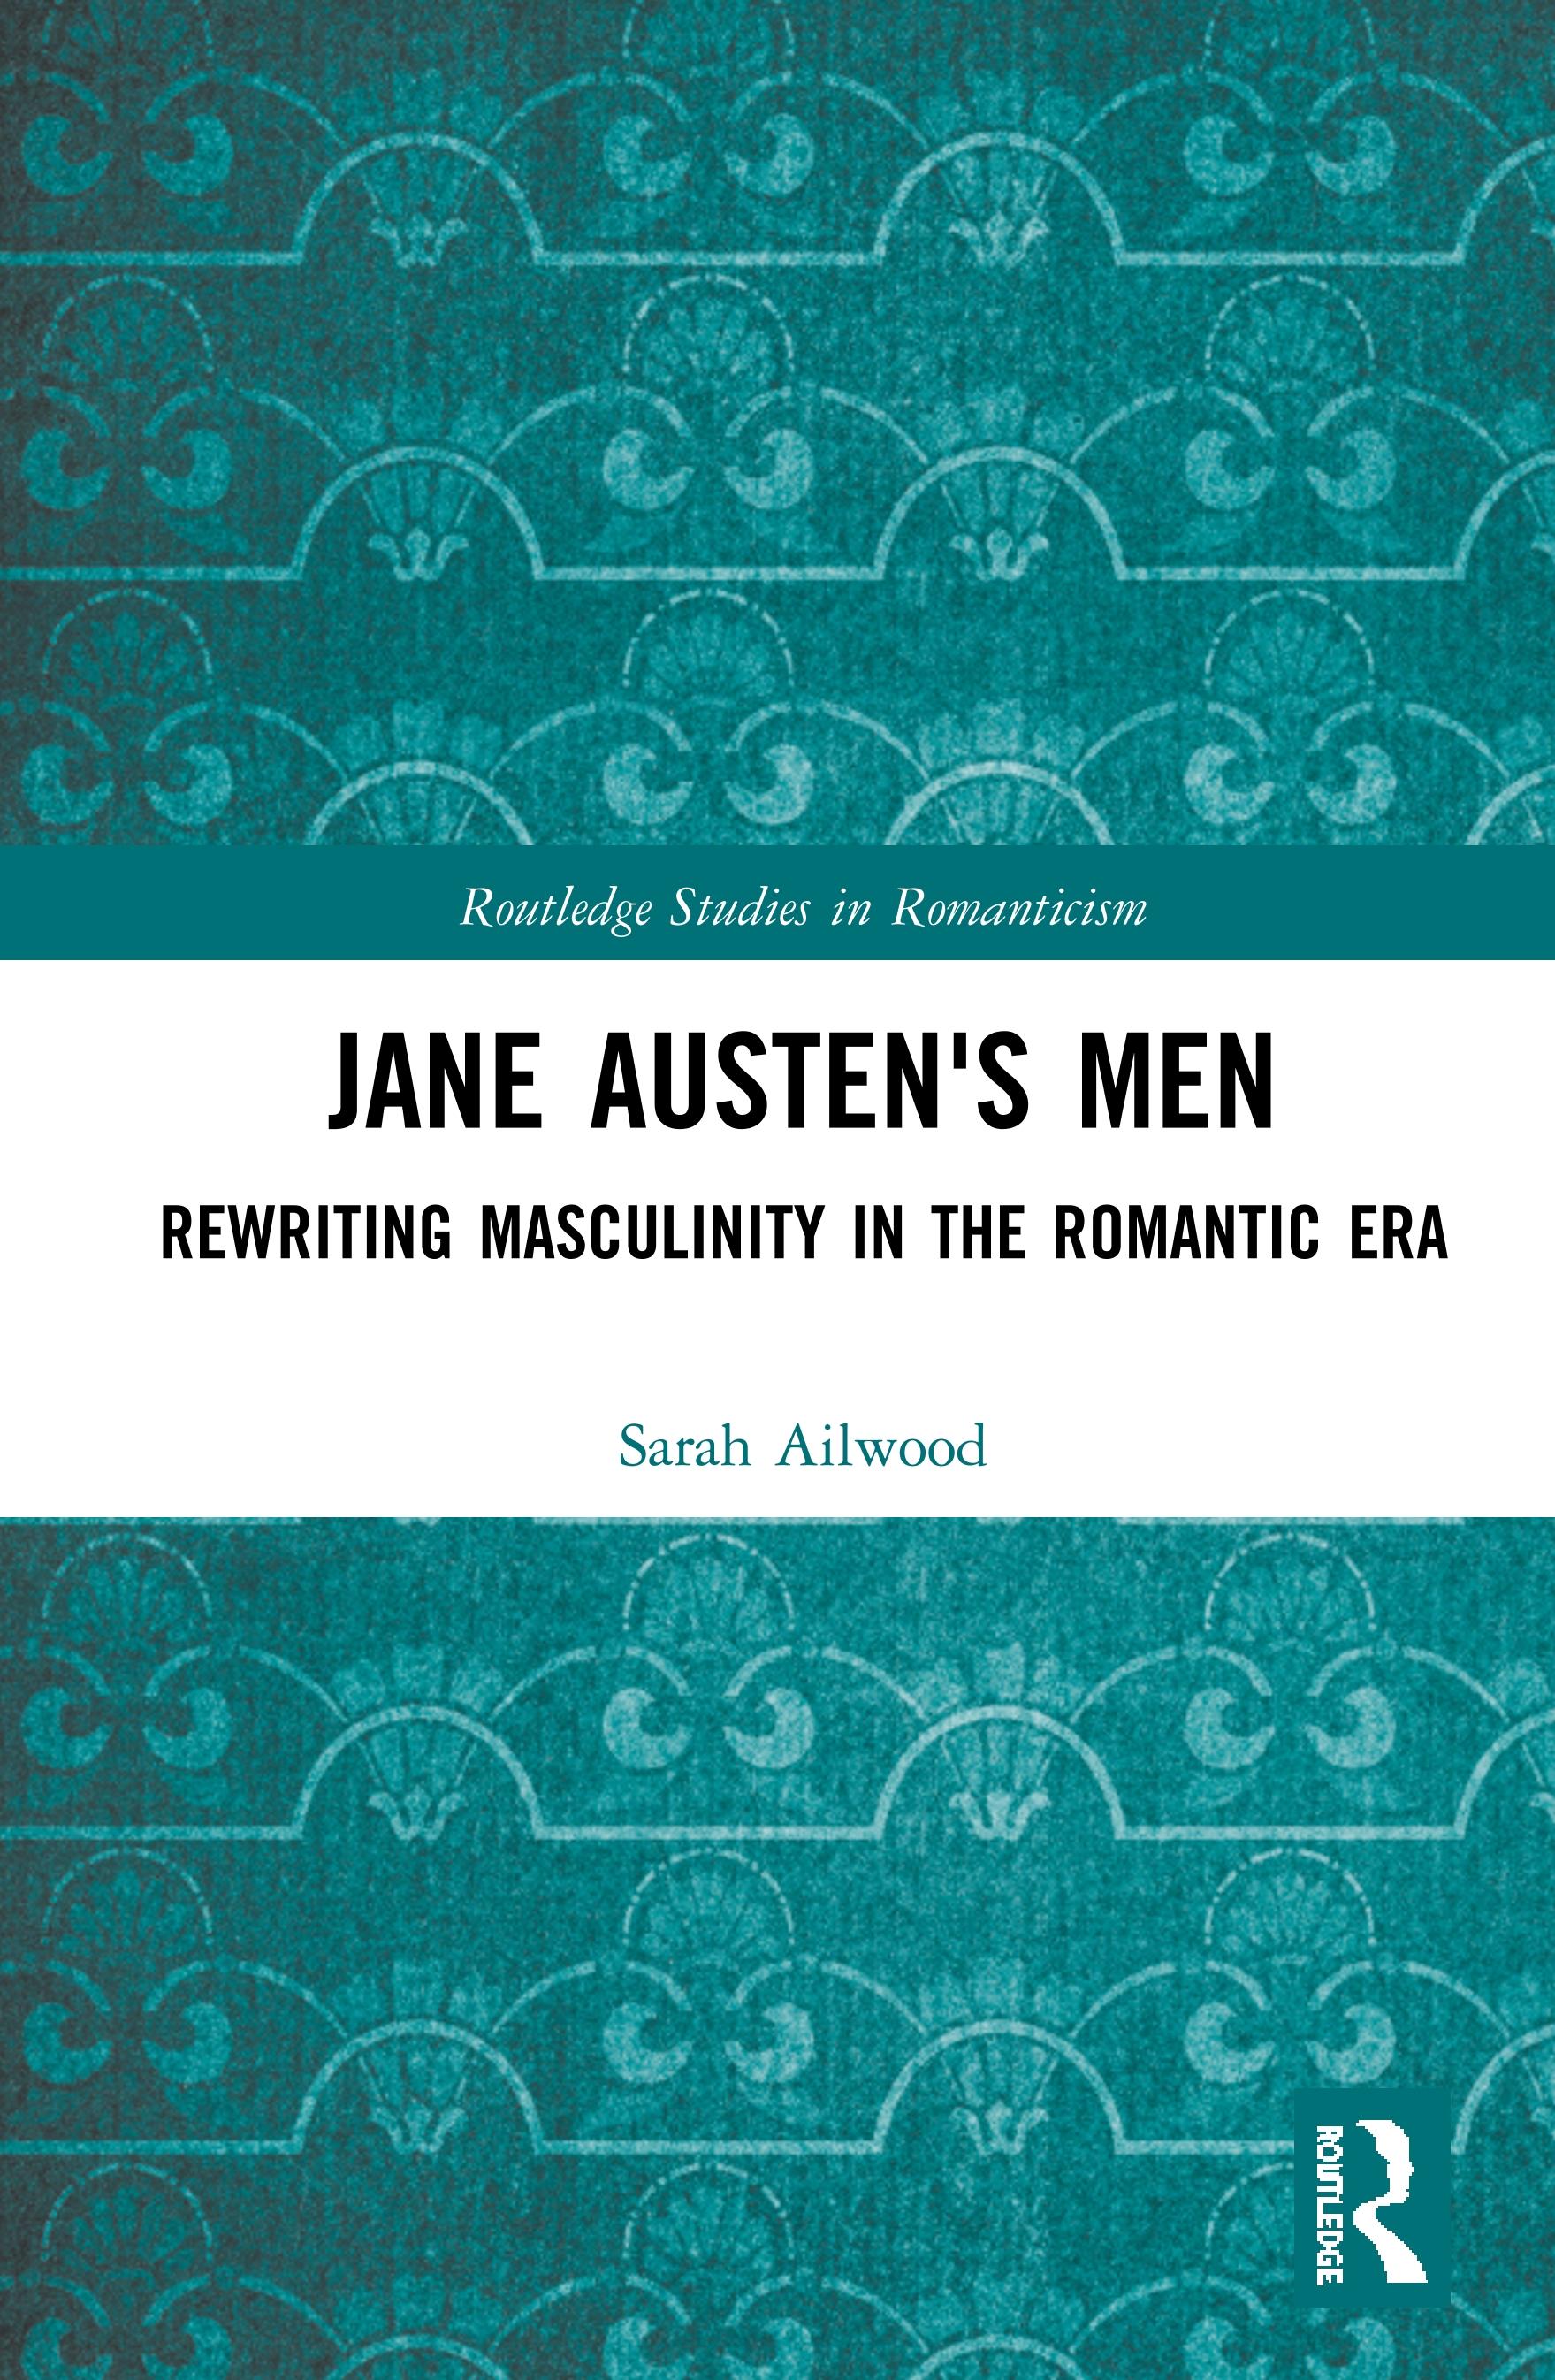 Jane Austen's Men: Rewriting Masculinity in the Romantic Era book cover